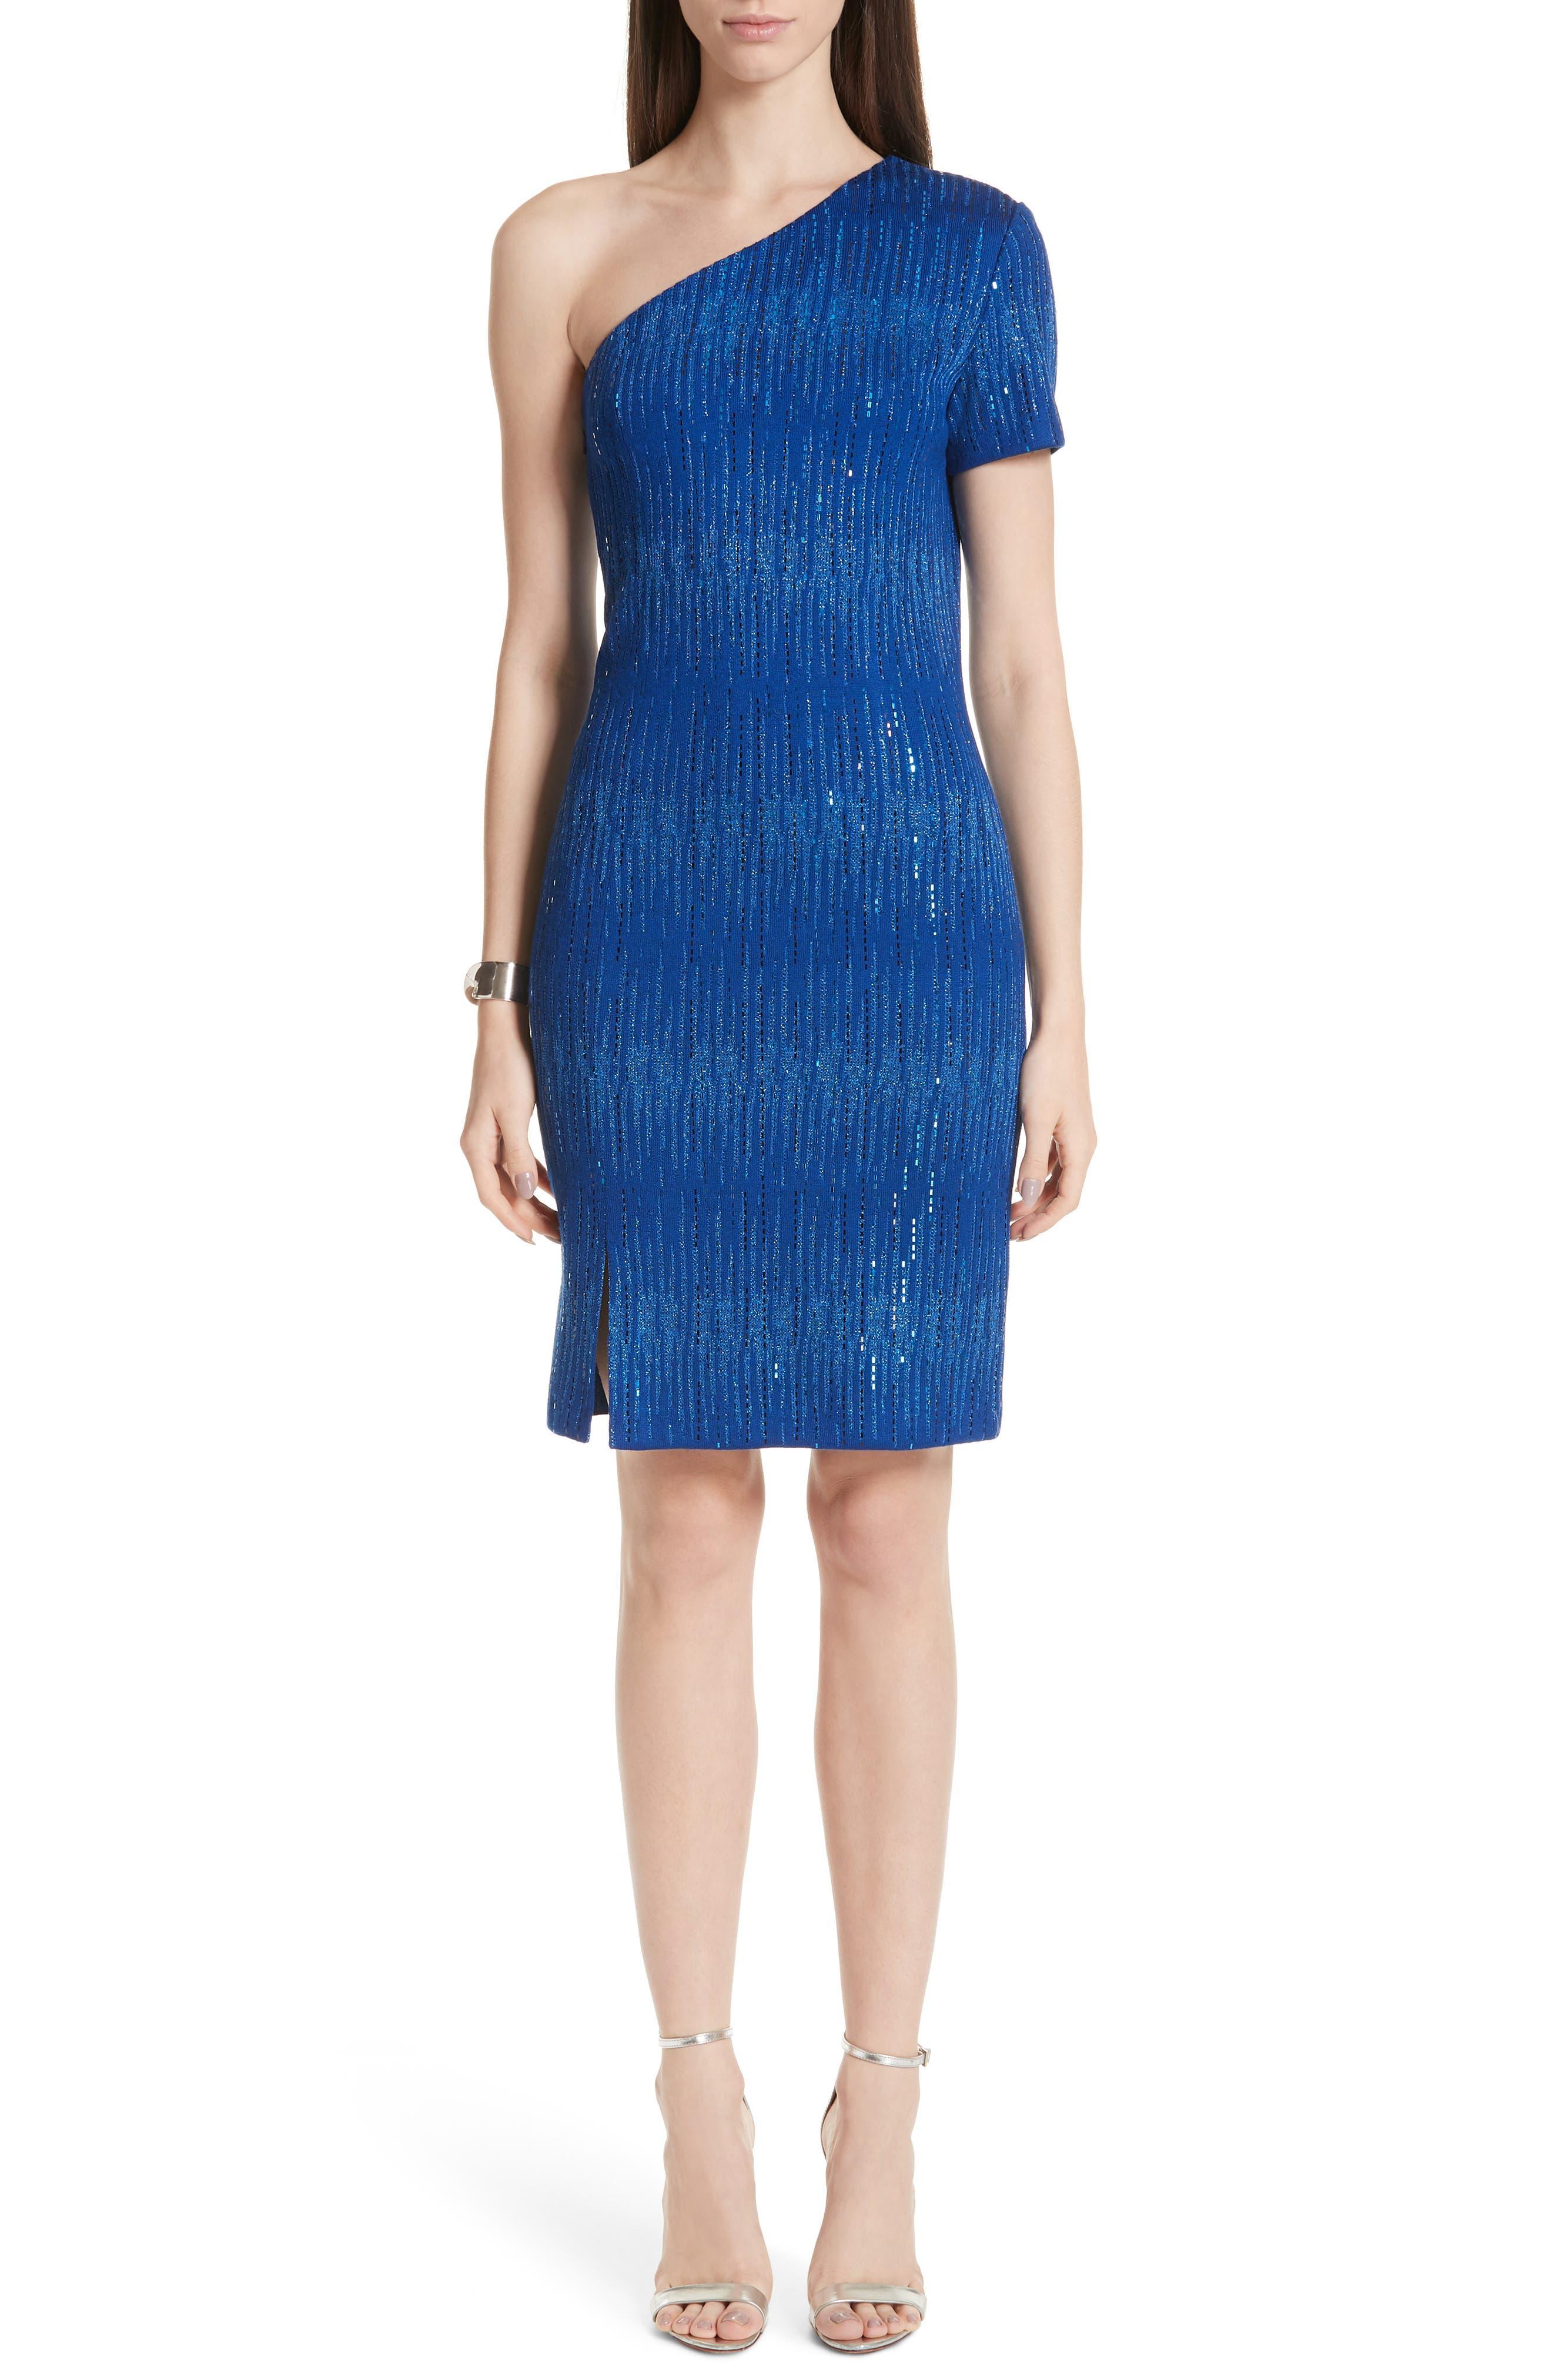 St. John Collection Carrie Knit One Shoulder Dress, Blue